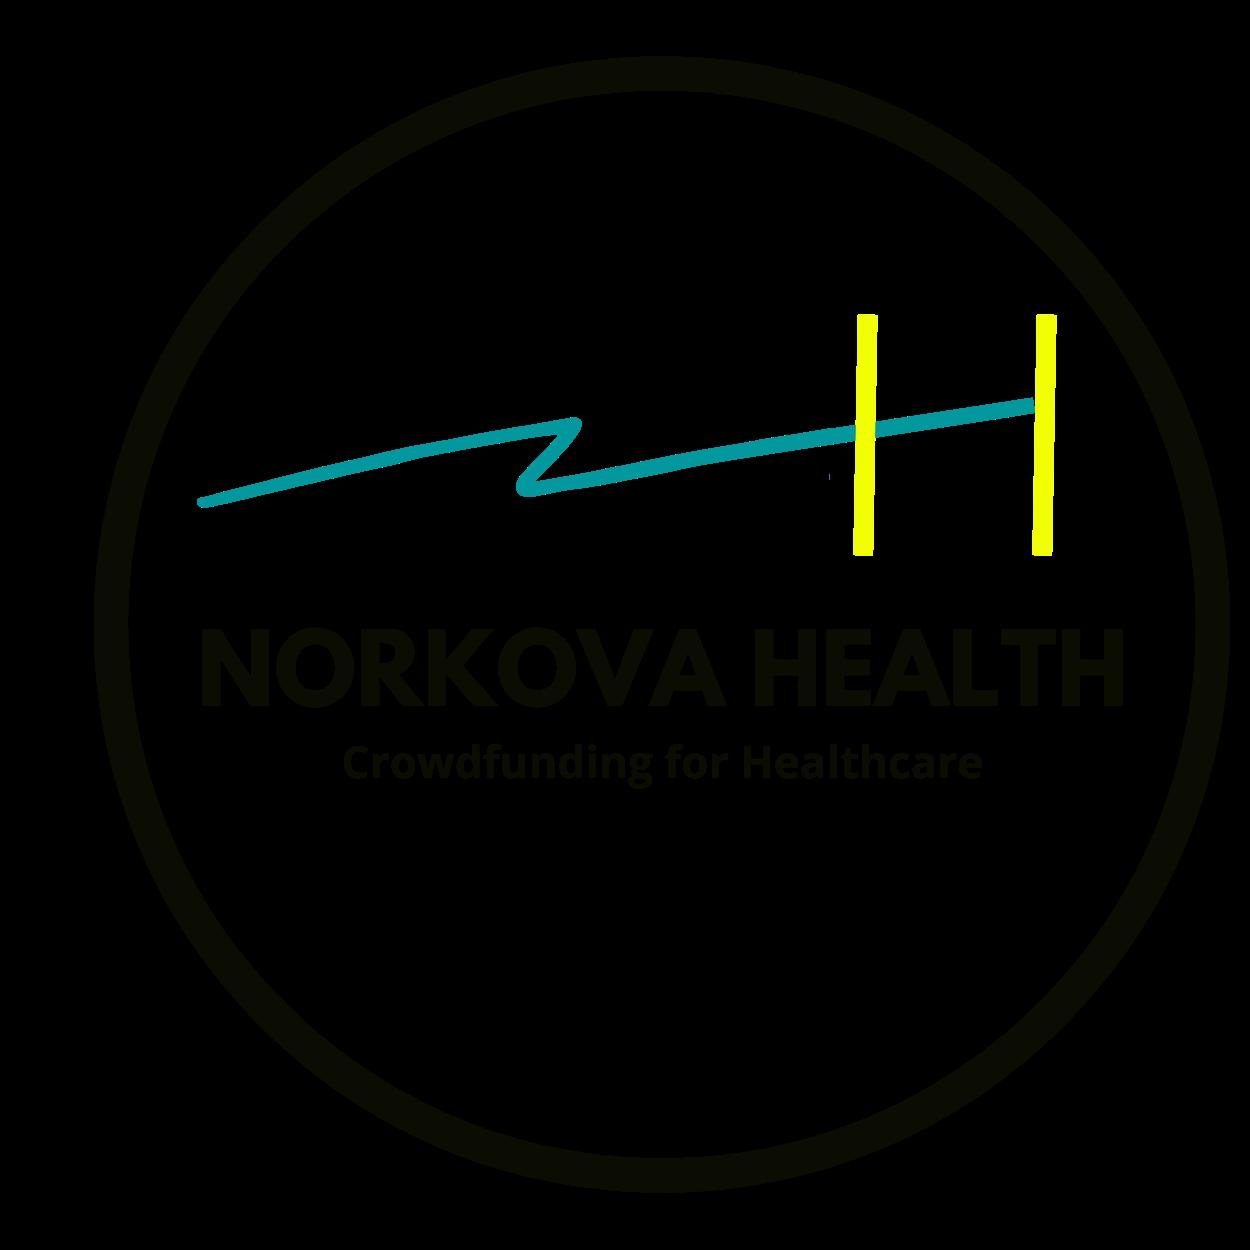 Norkova Health